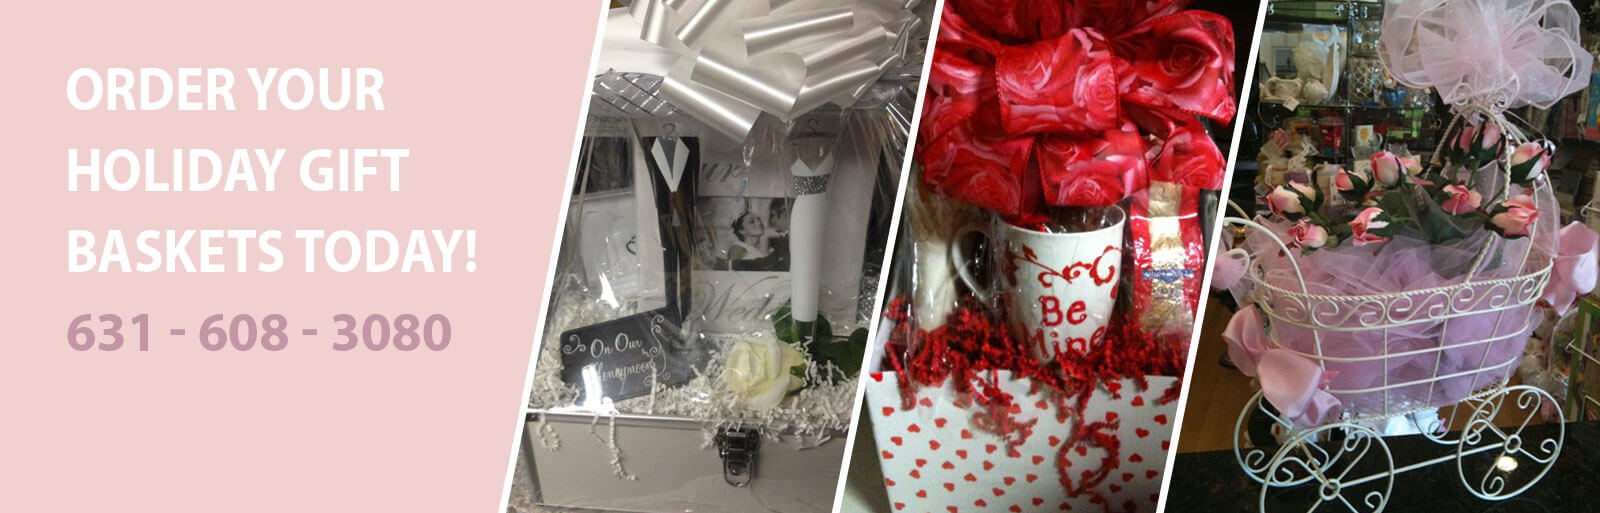 Long island gift baskets 631 608 3080 custom gift baskets long island gift baskets 631 608 3080 custom gift baskets holiday gift baskets diaper cakes negle Choice Image